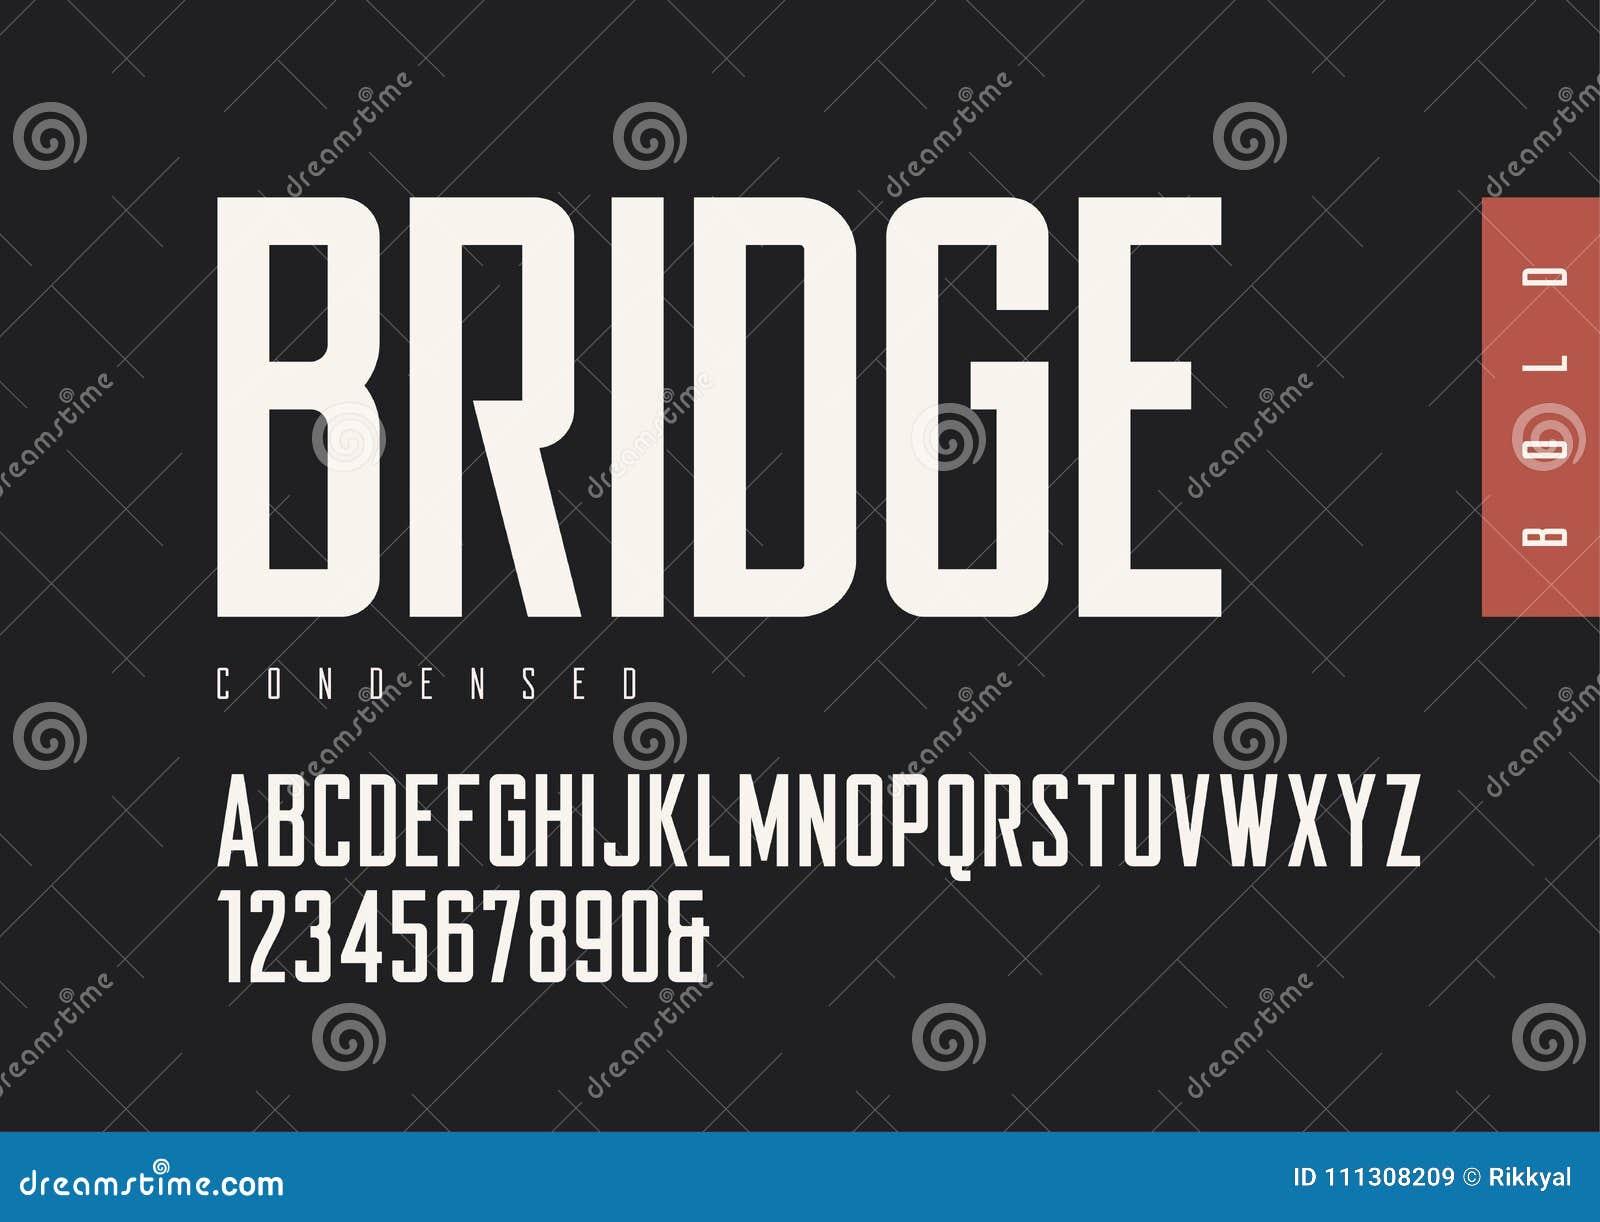 Condensed Bold Retro Sans Serif  Vector Typefaces, Uppercase